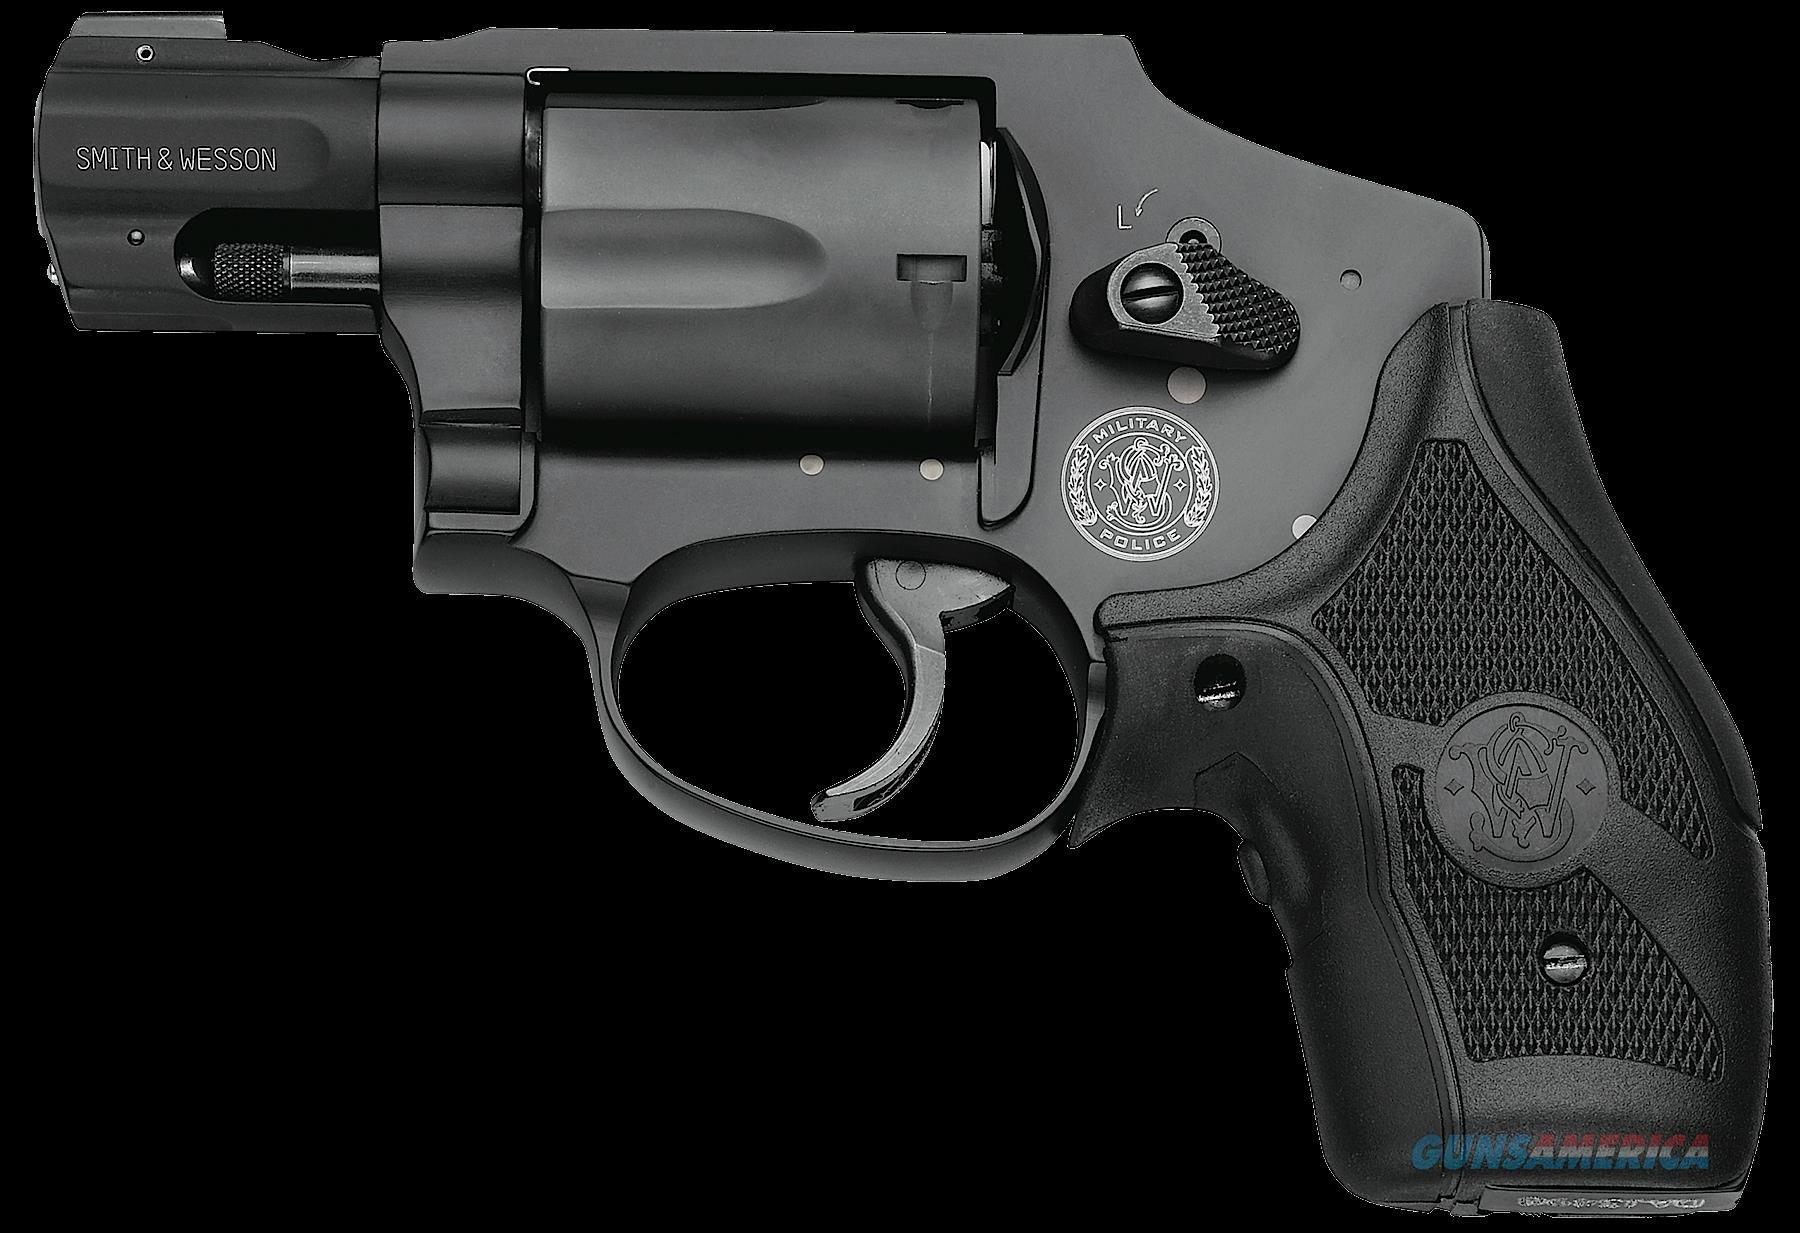 Smith & Wesson M&p 340, S&w M&p340ct  163073 357 2 Ct           Blk  Guns > Pistols > 1911 Pistol Copies (non-Colt)